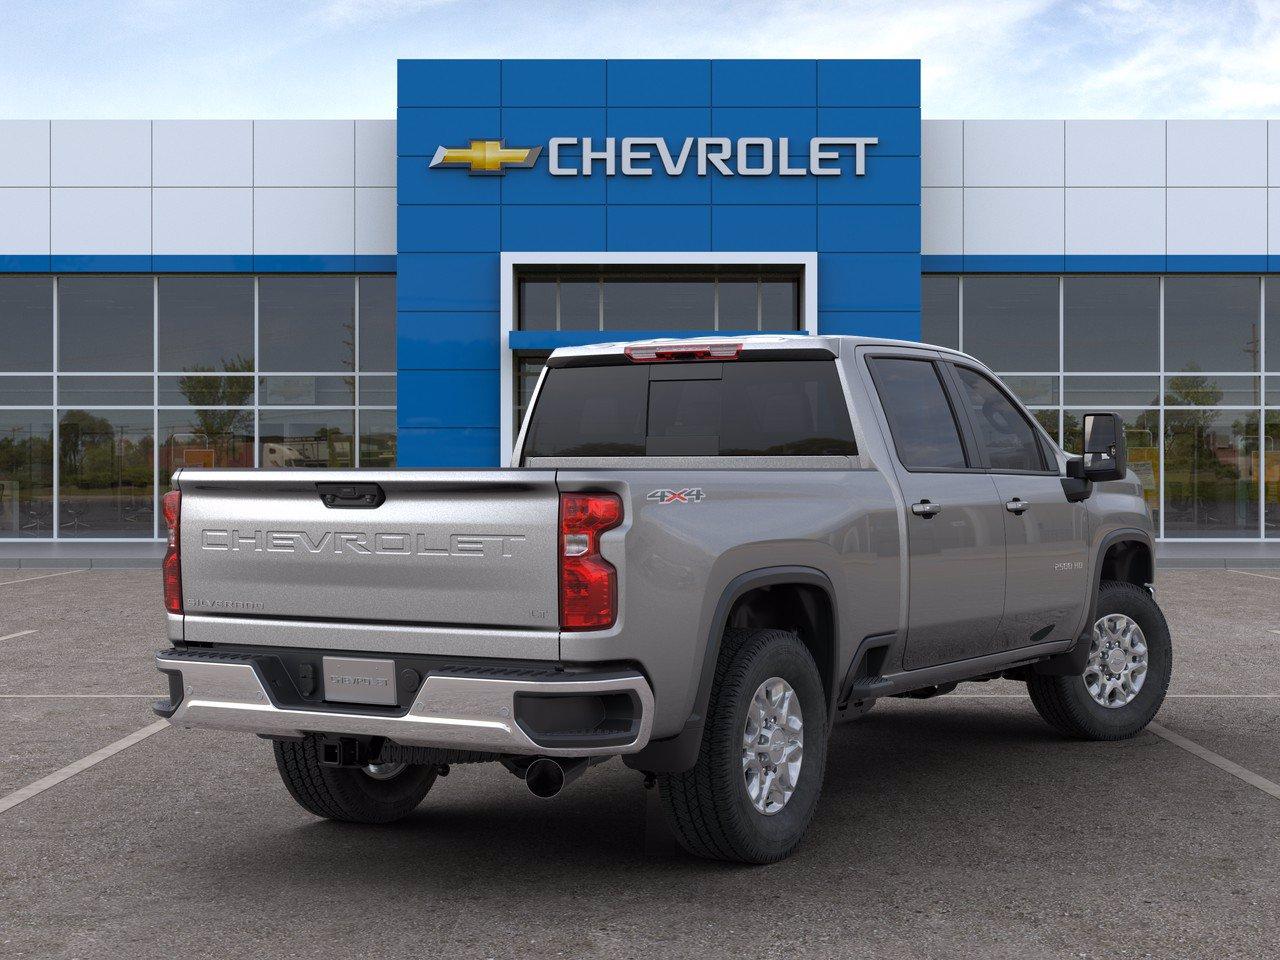 2020 Chevrolet Silverado 2500 Crew Cab 4x4, Pickup #C201630 - photo 2